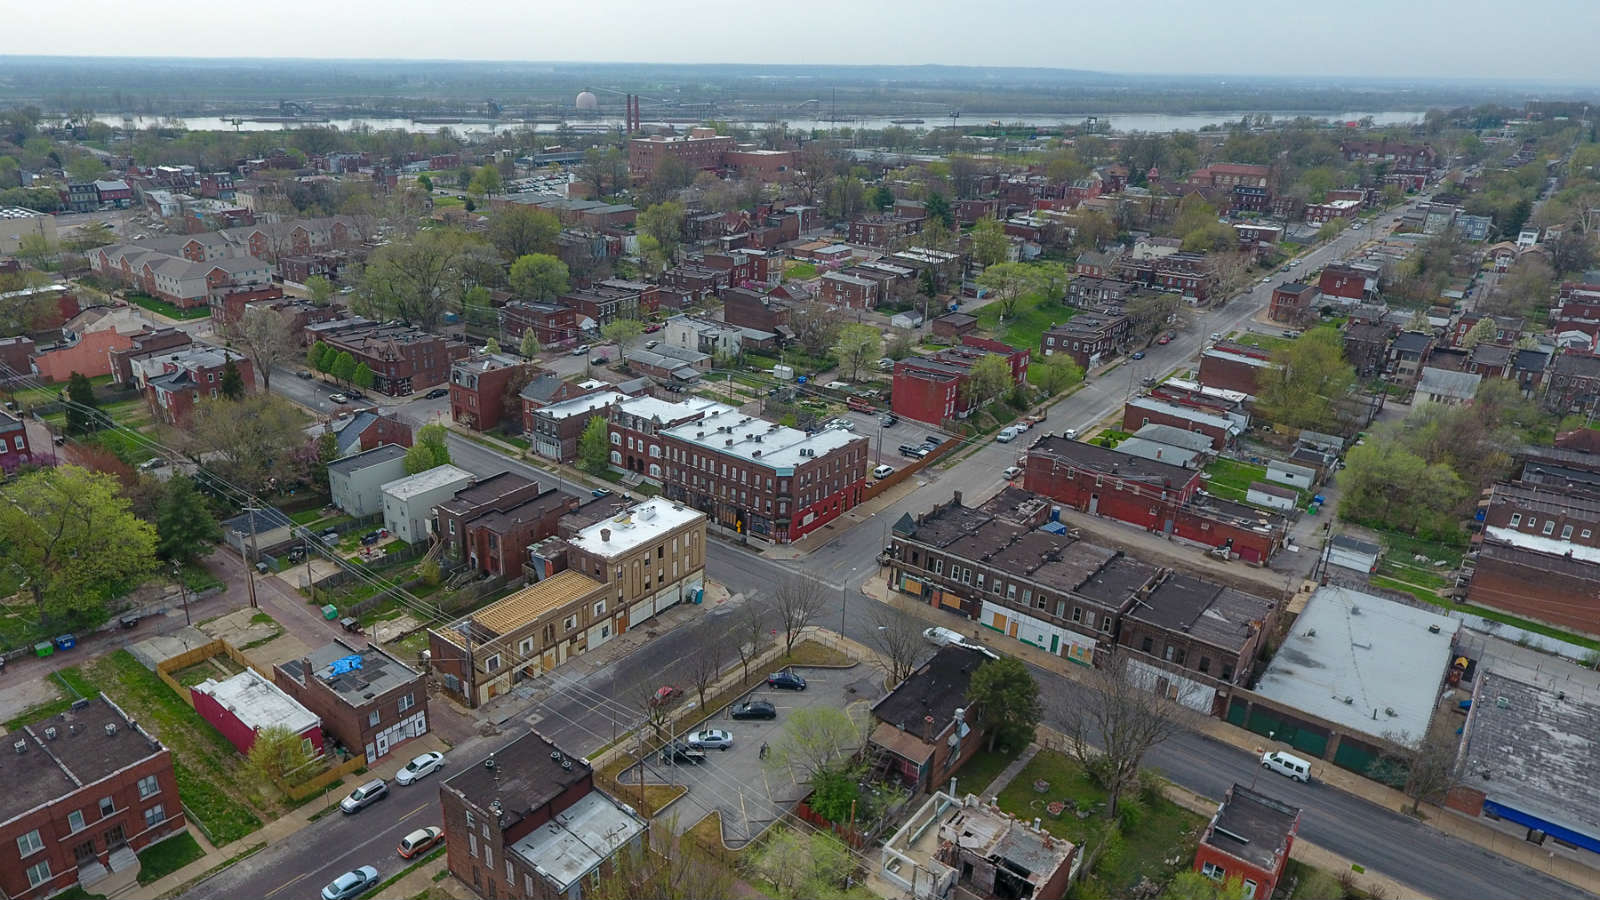 Planning Commission Adopts Gravois-Jefferson Neighborhood Plan